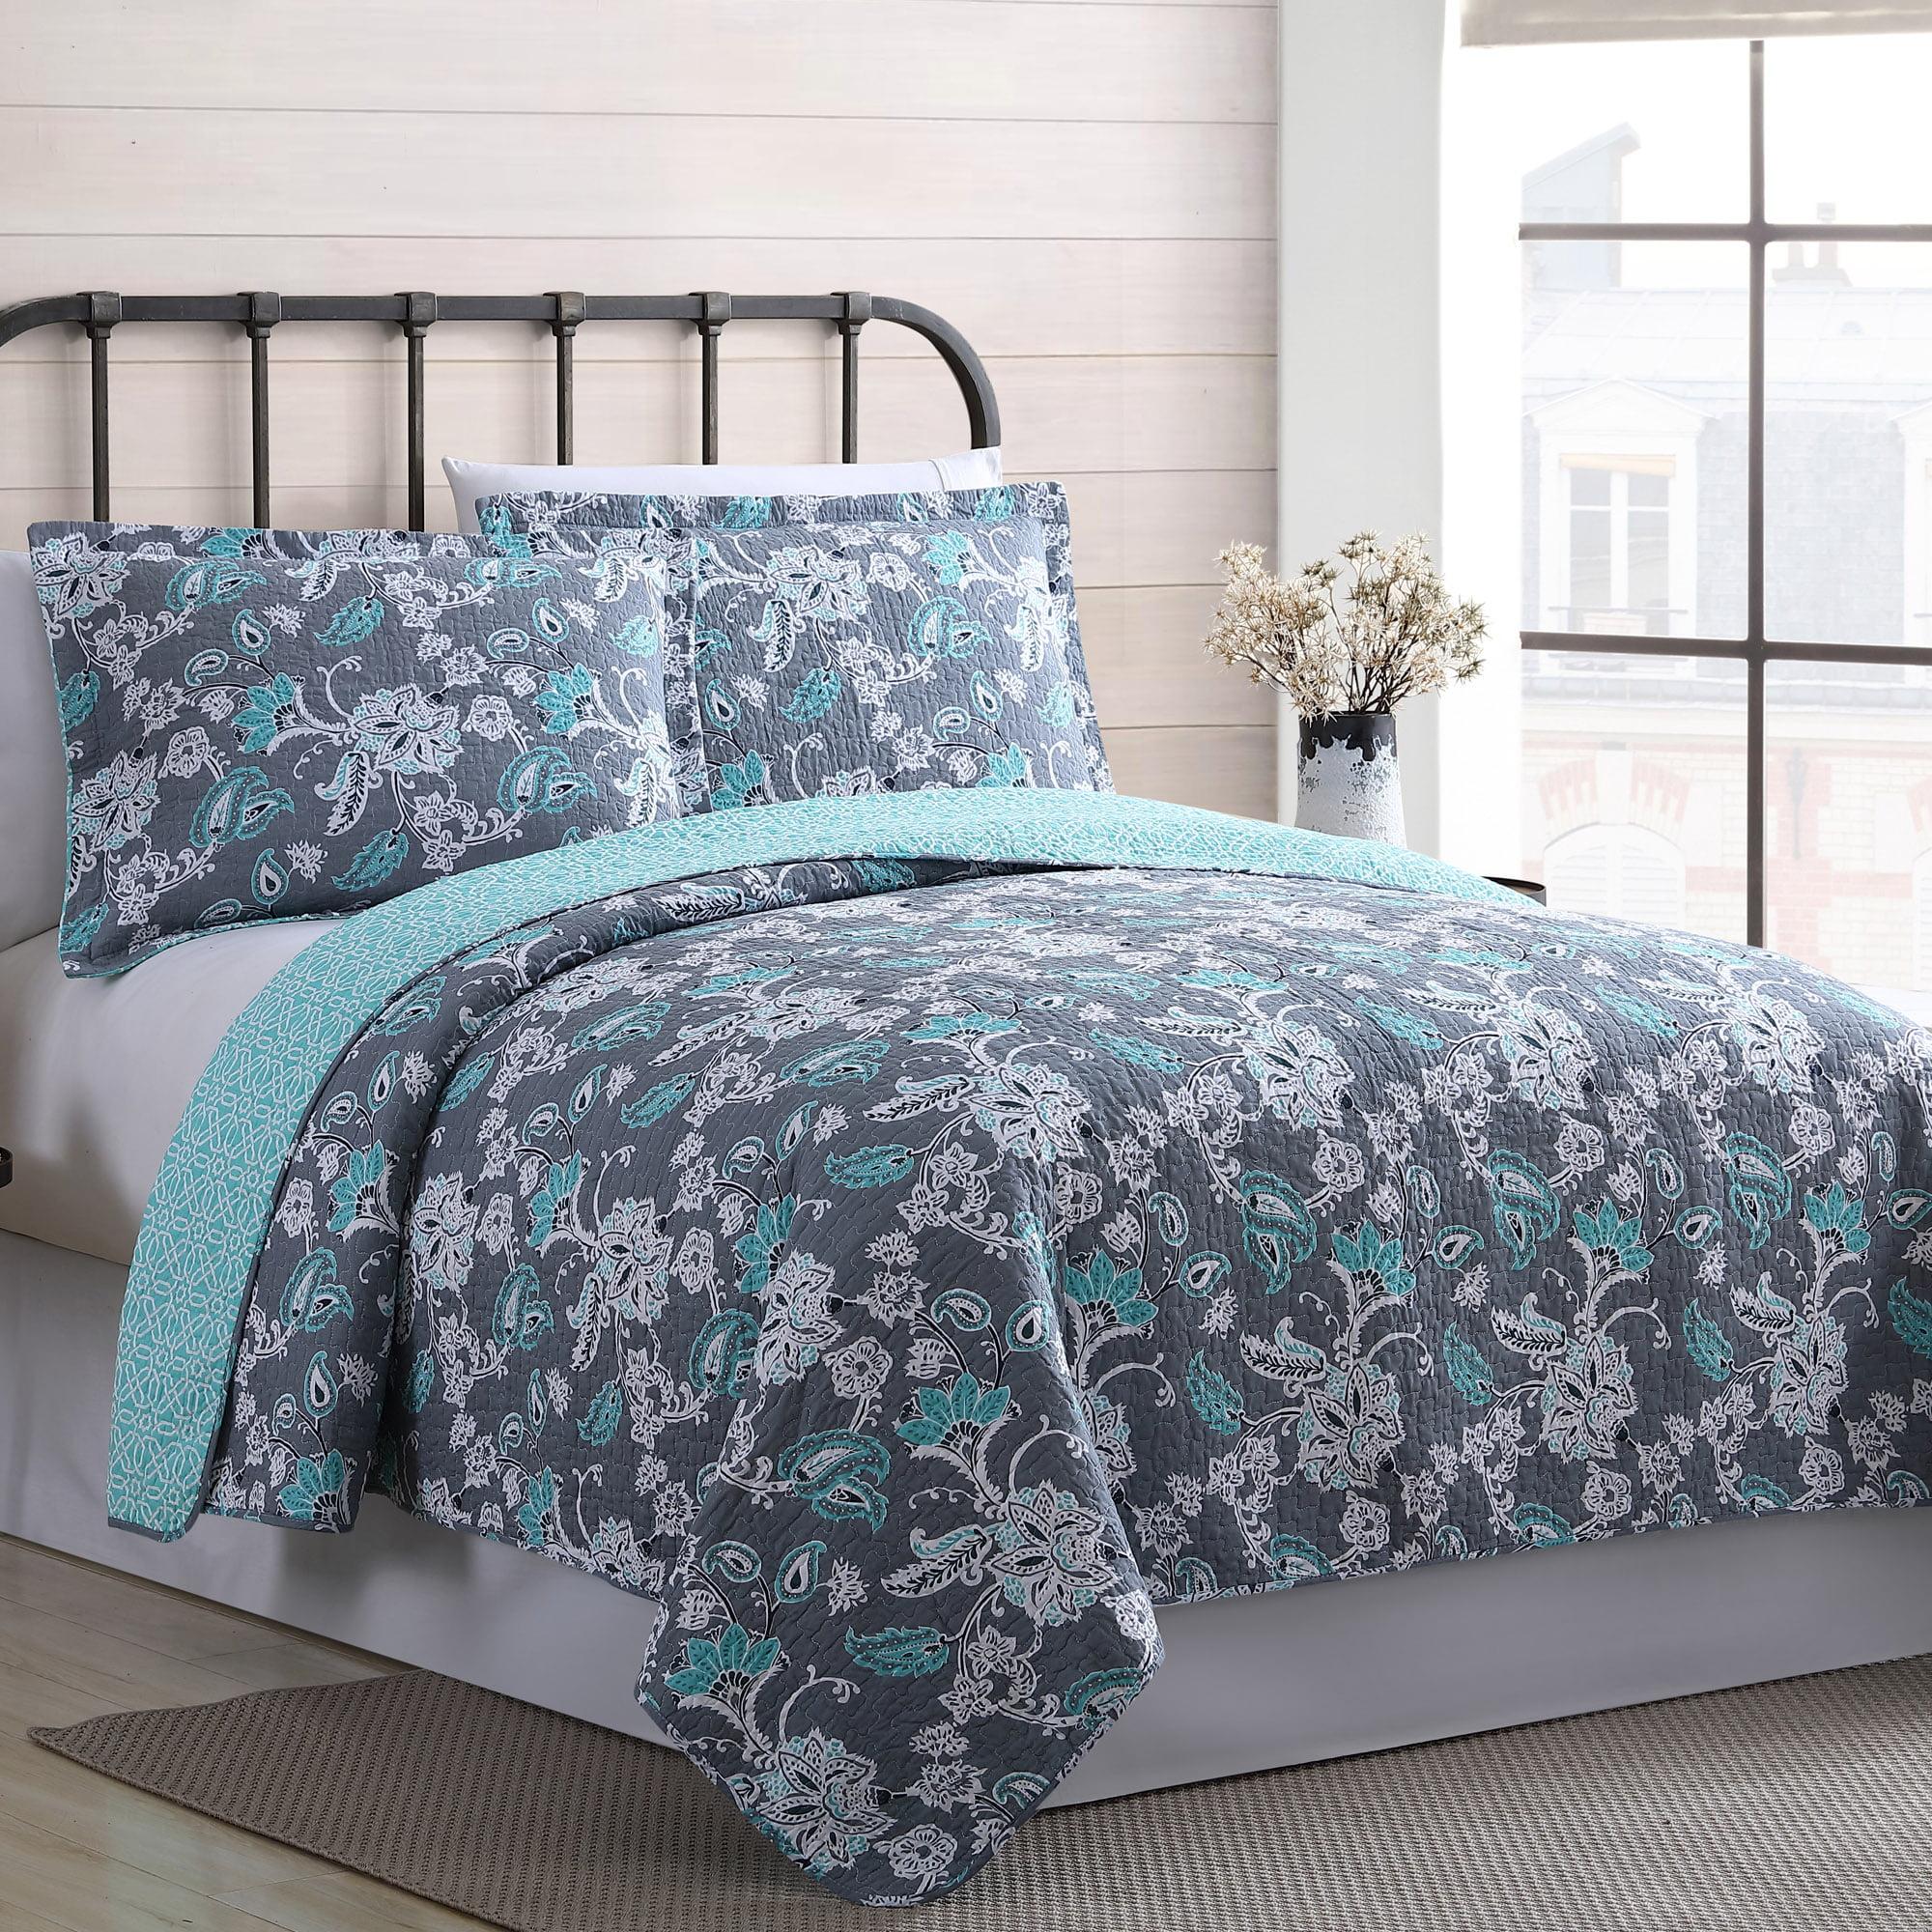 100 Cotton 3 Piece Printed Reversible Quilt Set Agnes Full Queen Walmart Com Walmart Com